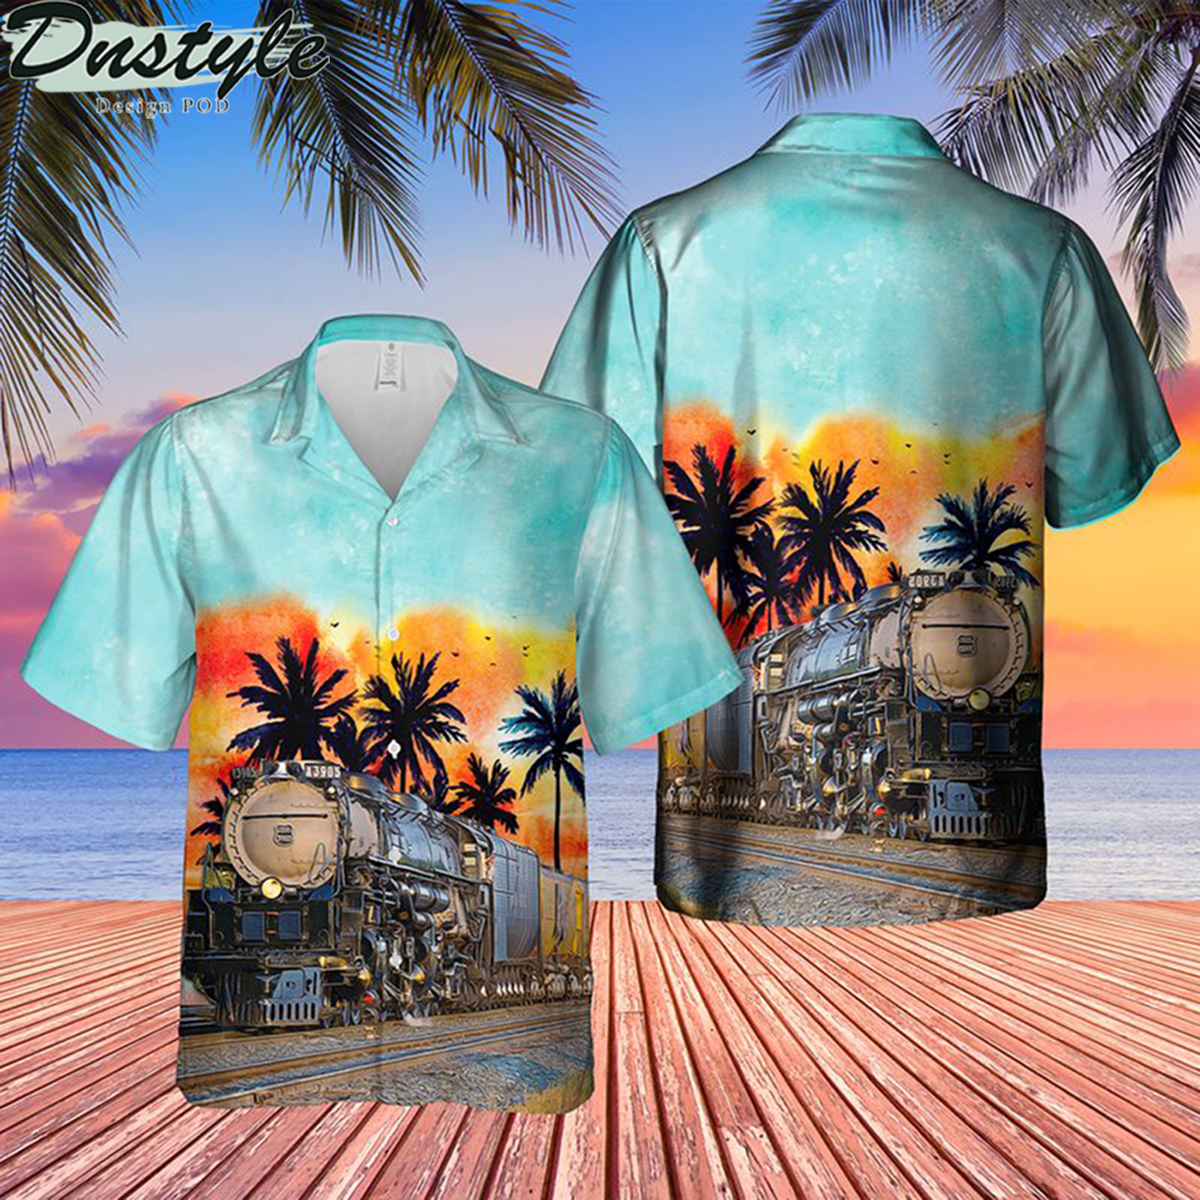 Union pacific challenger no 3985 blue sky hawaiian shirt 2